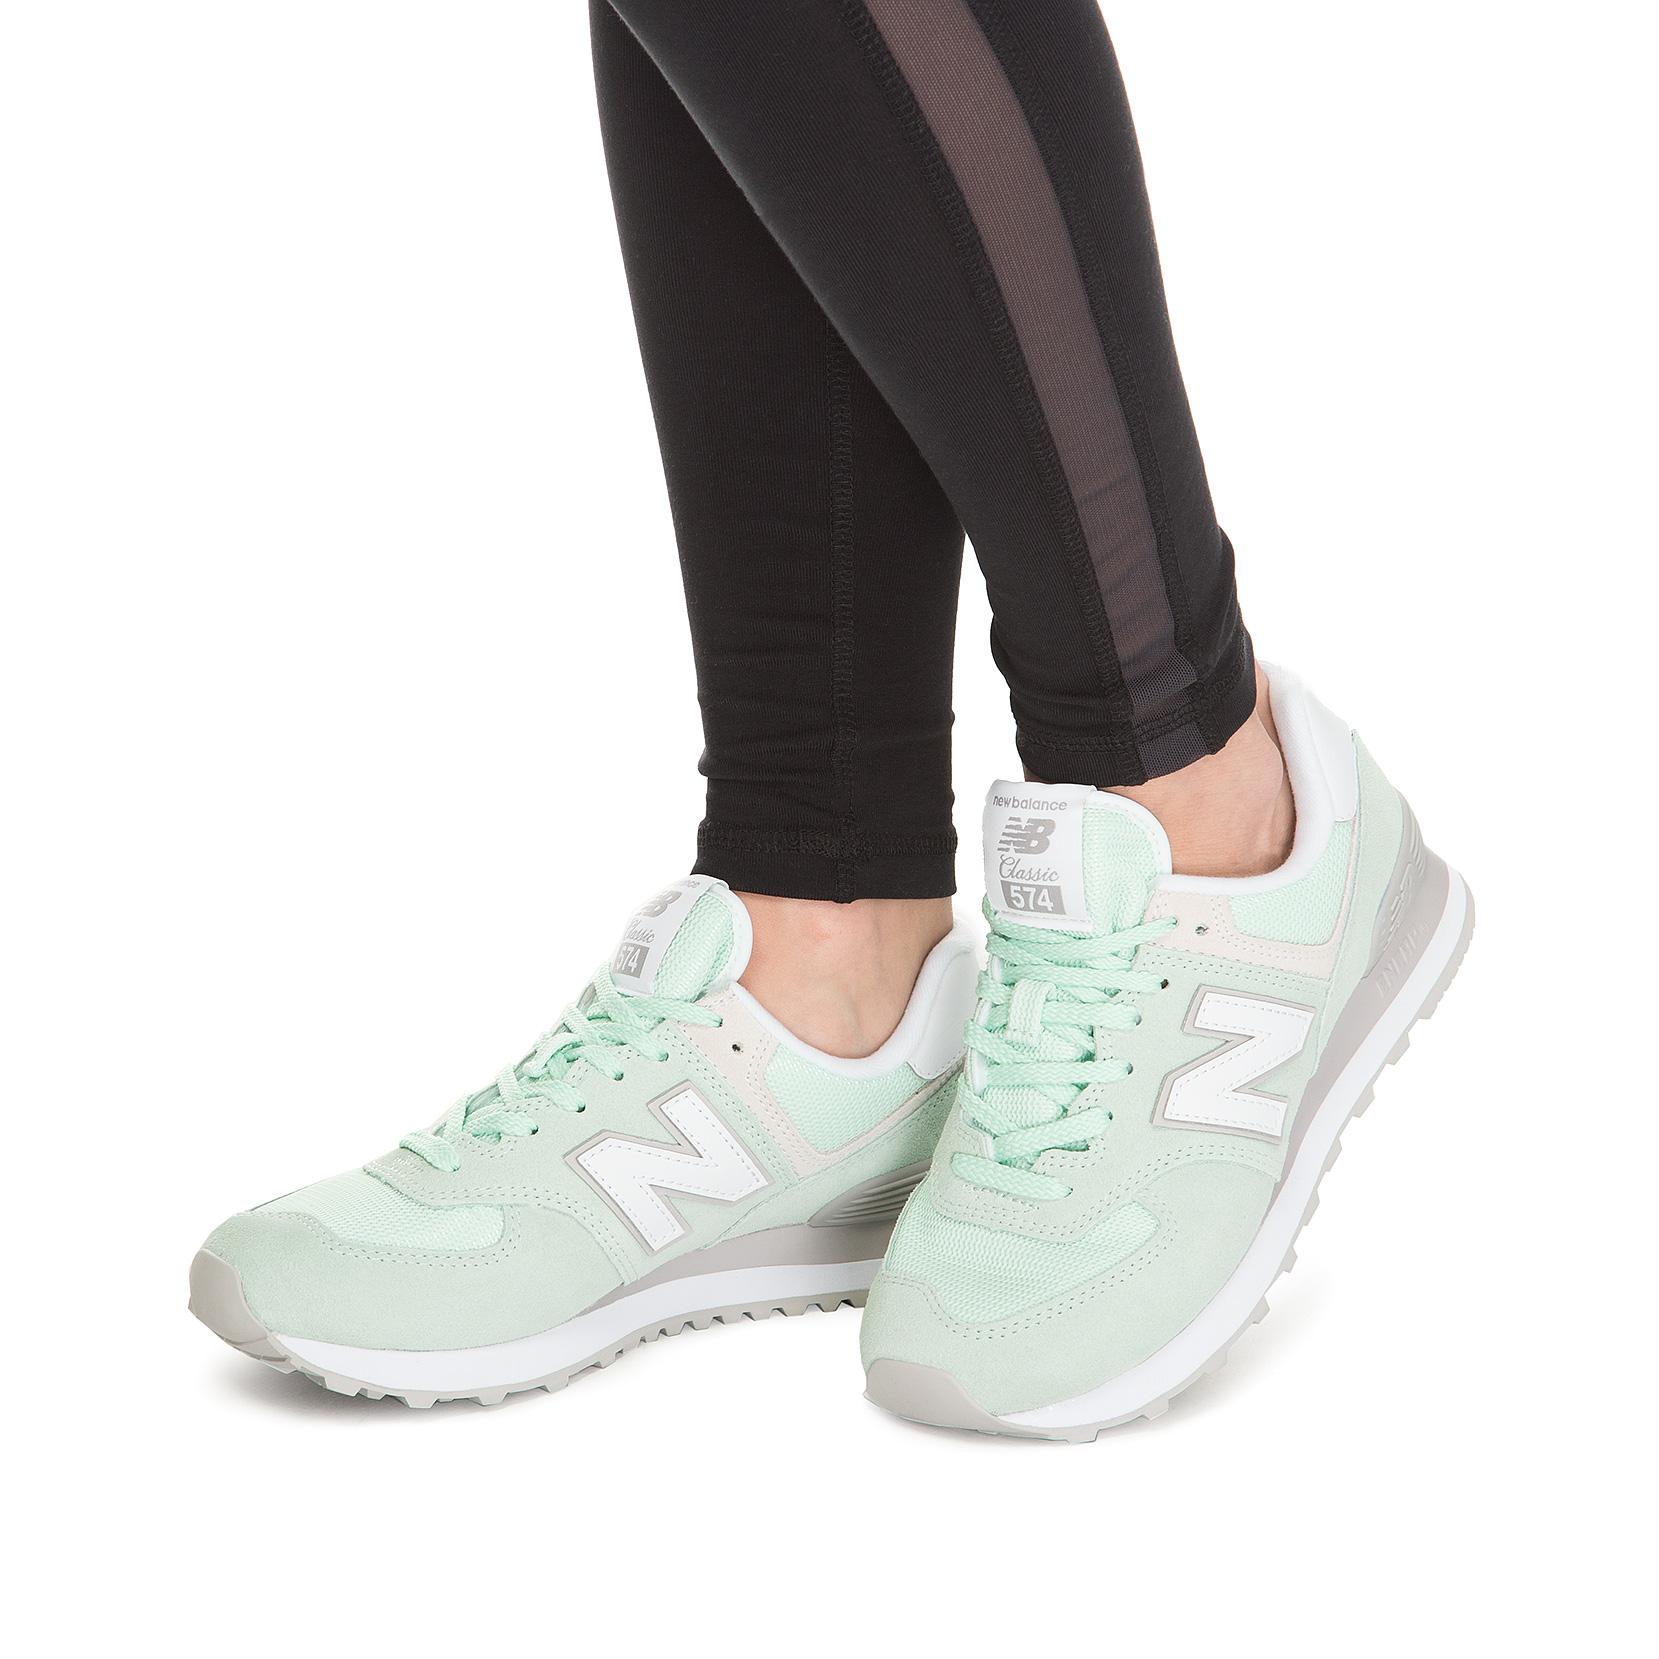 Жіноче взуття повсякденне New Balance 574 WL574ESM | New Balance